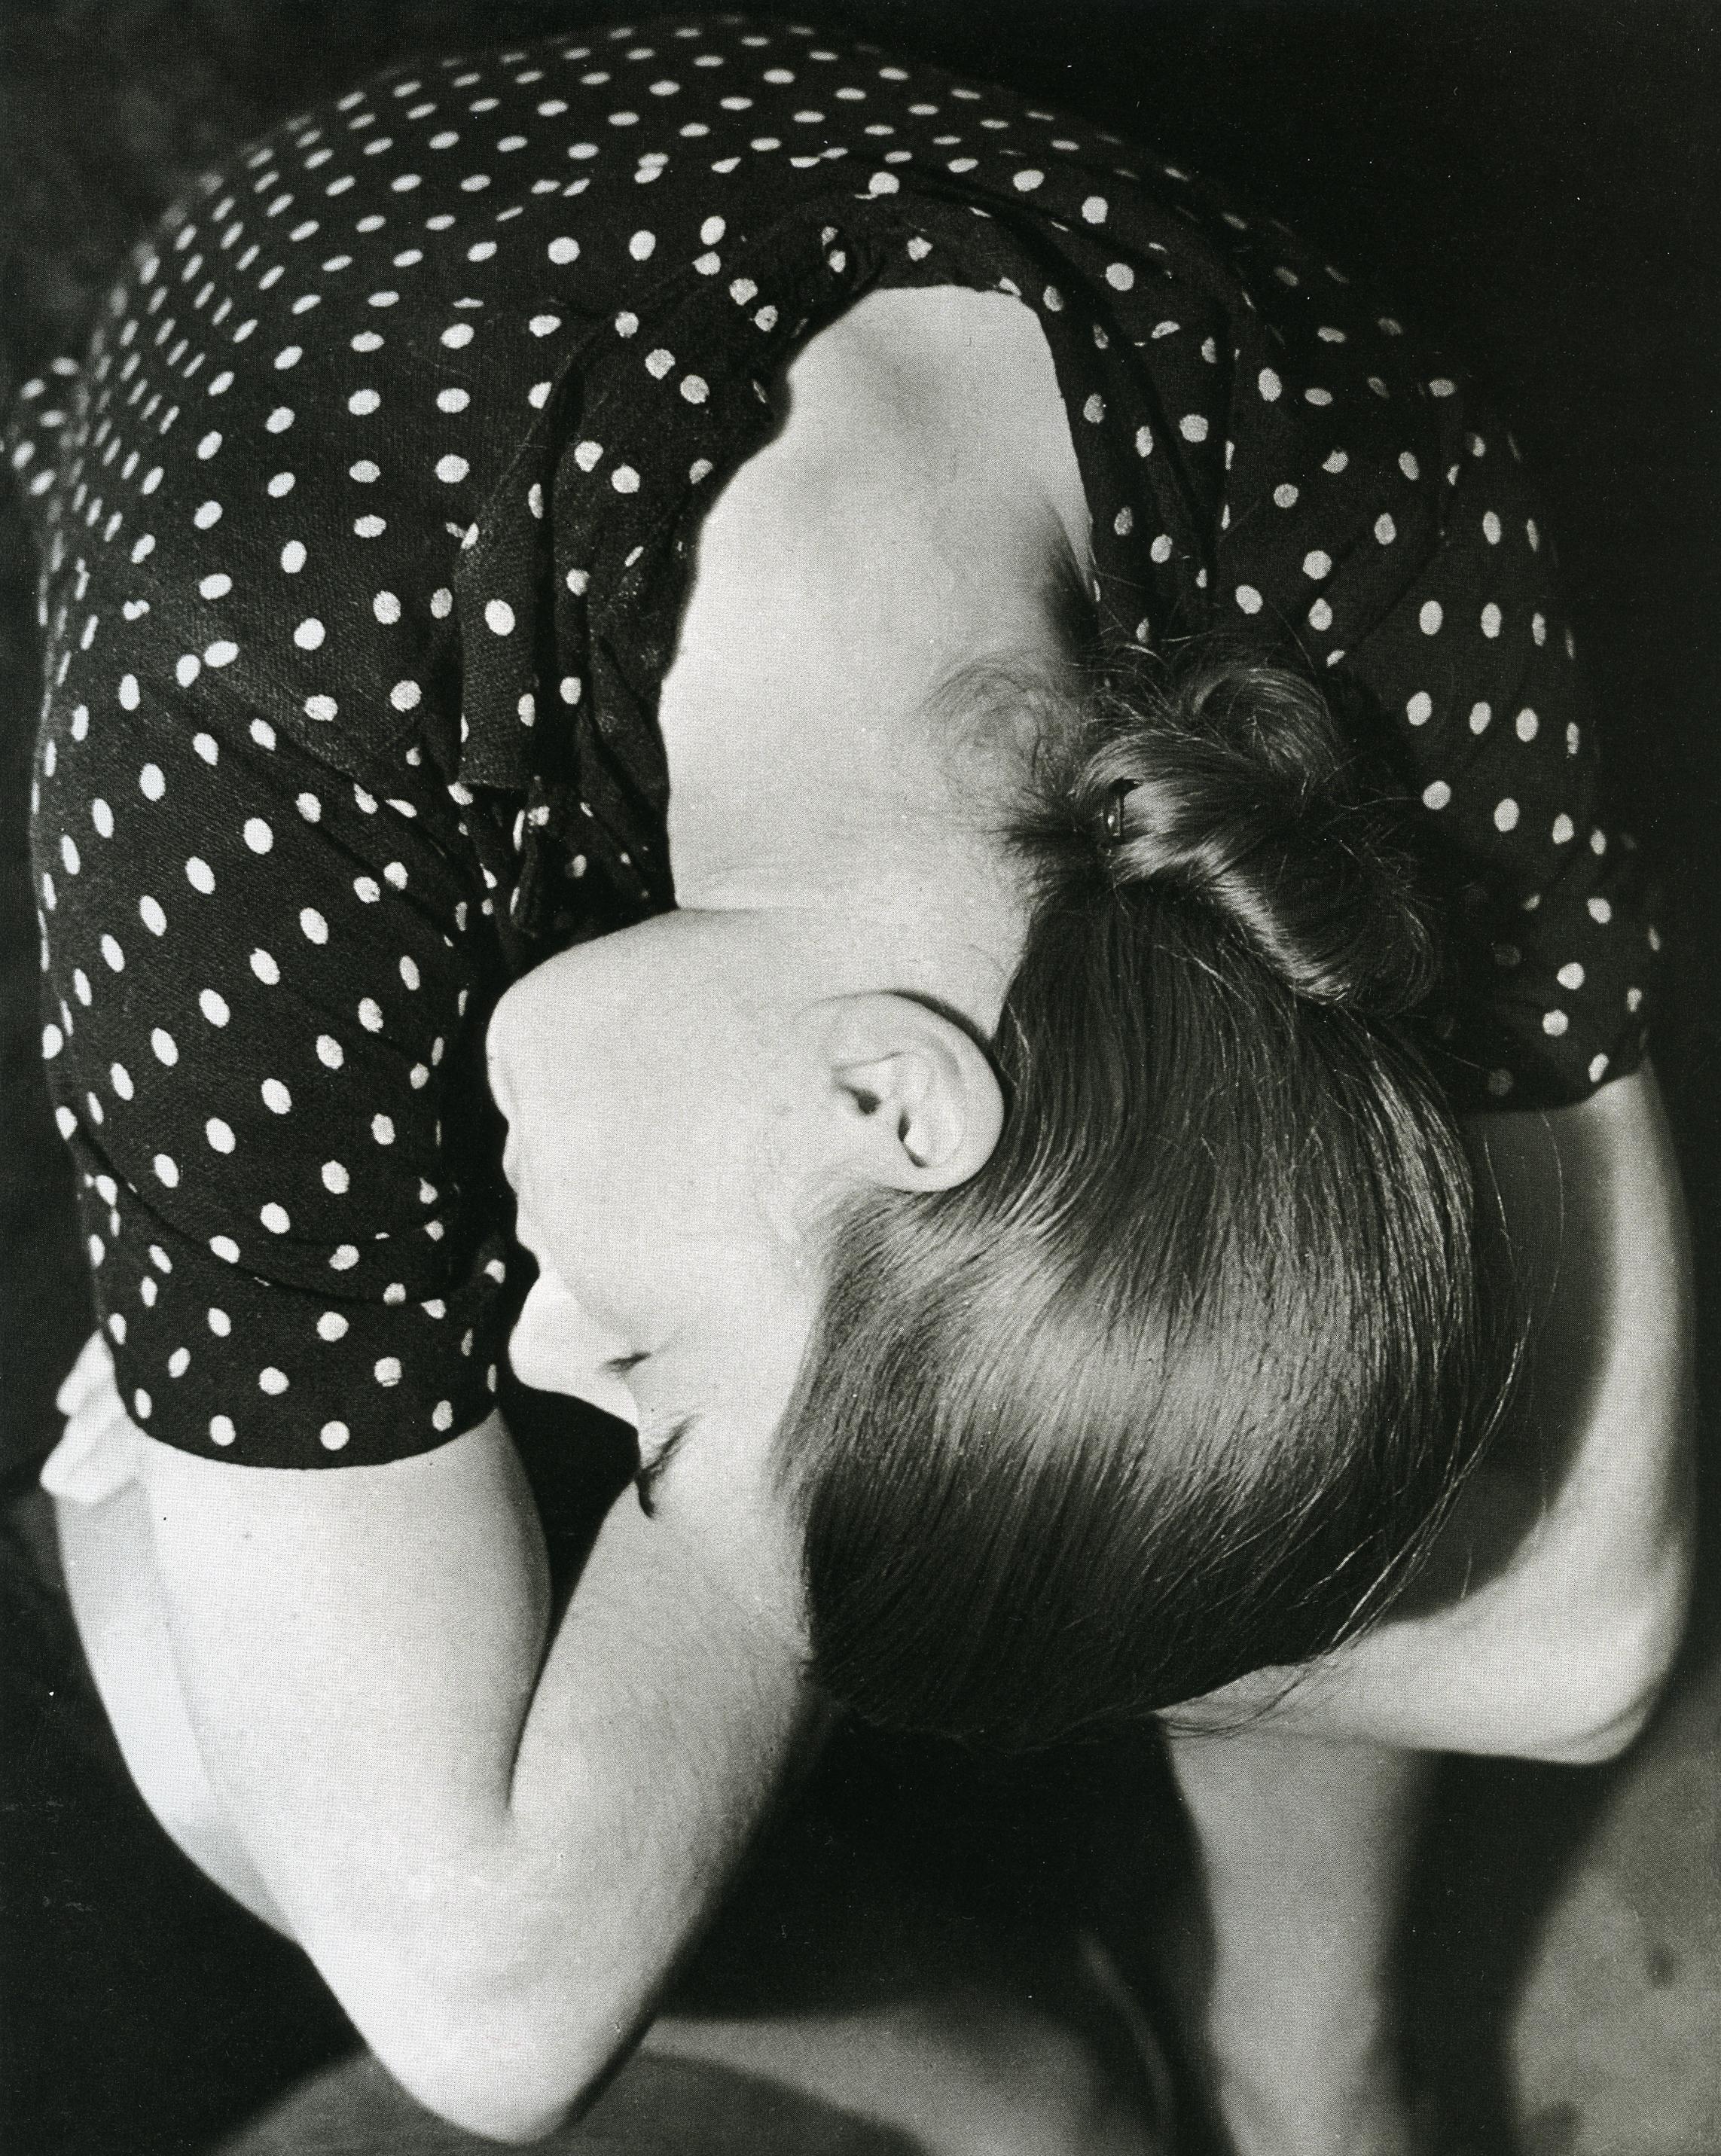 eva penninck amsterdam 1932 by Erwin Blumenfeld